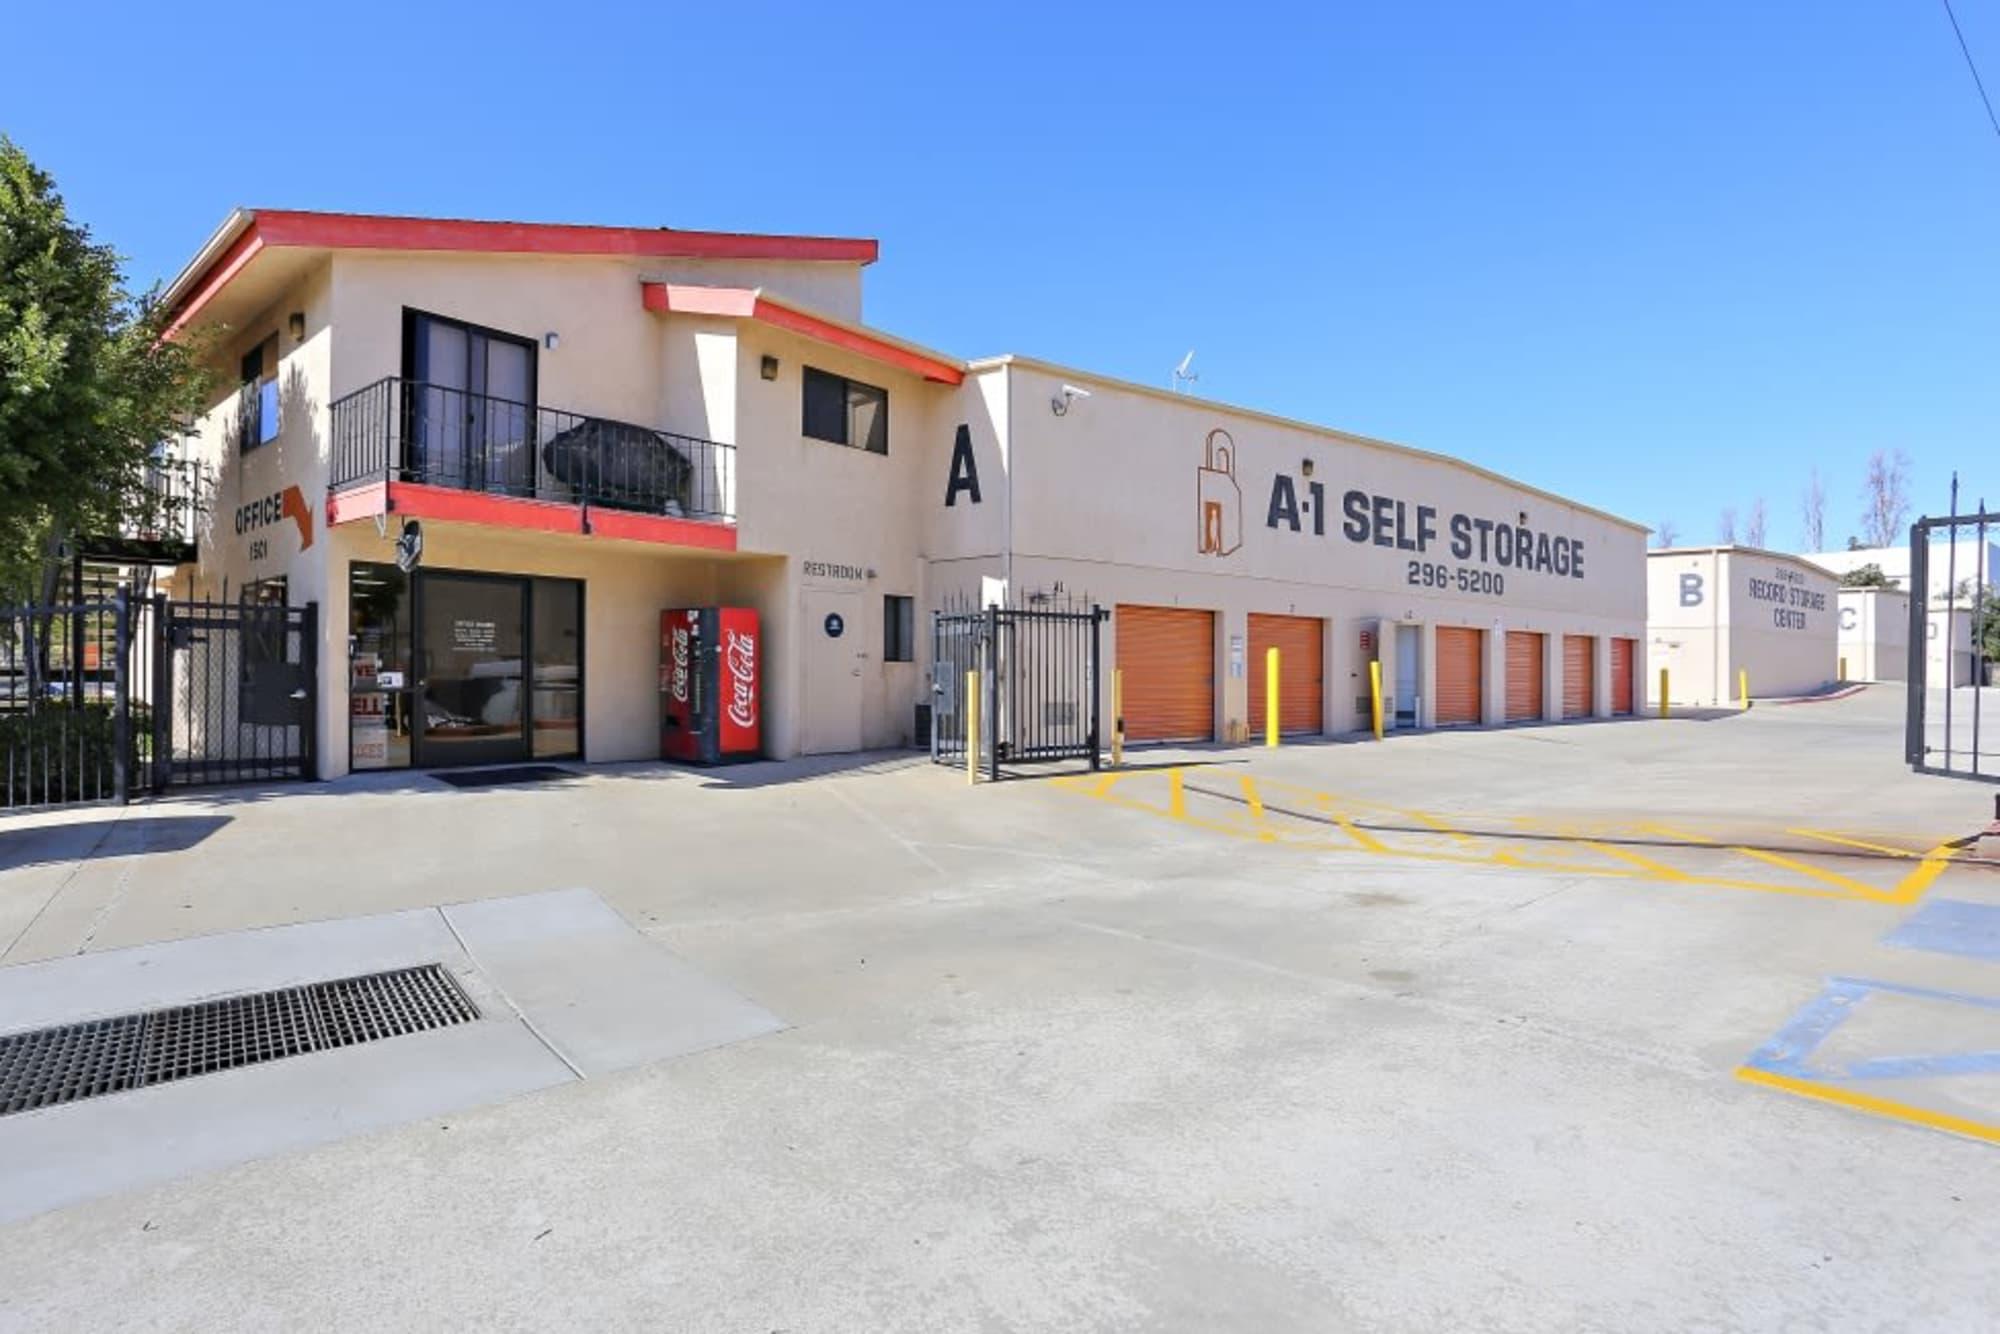 Best Storage Facility in A-1 Self Storage in San Diego, CA